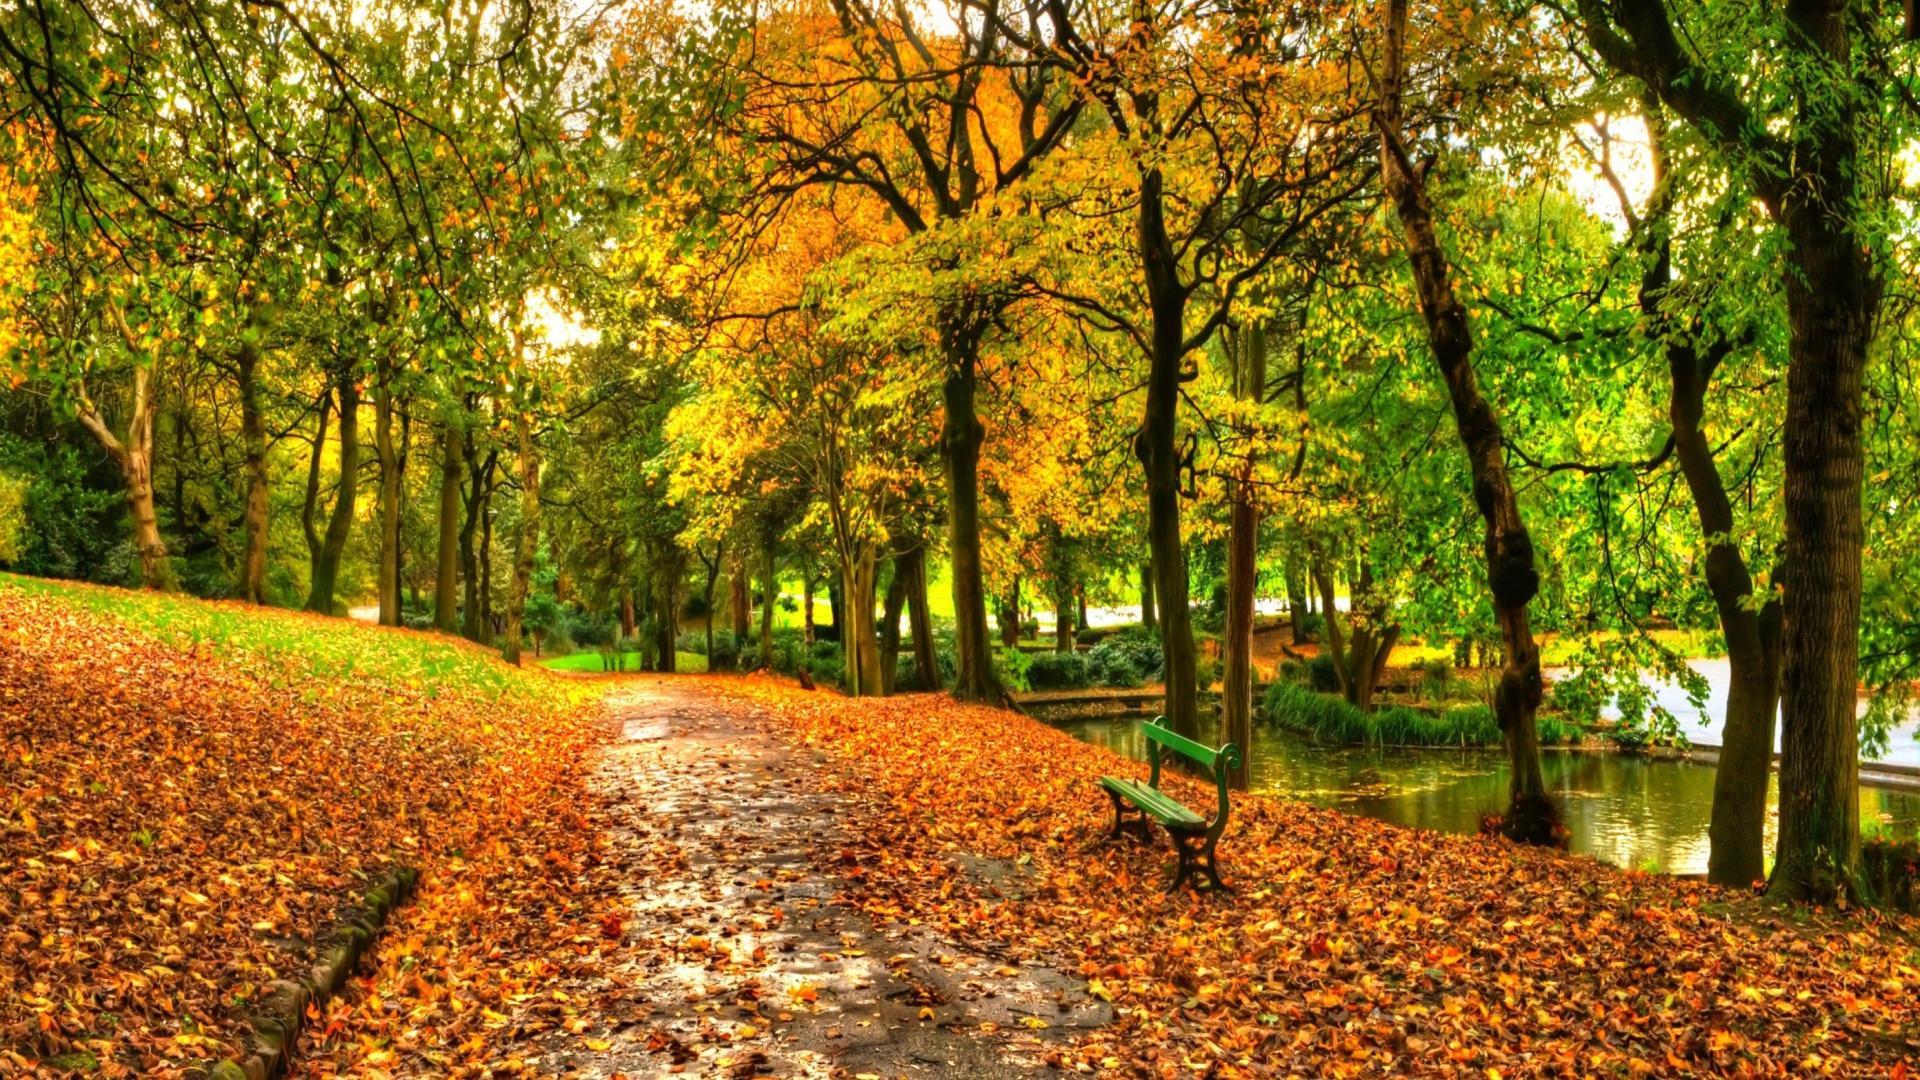 autumn park wallpaper 1920x1080 - photo #4